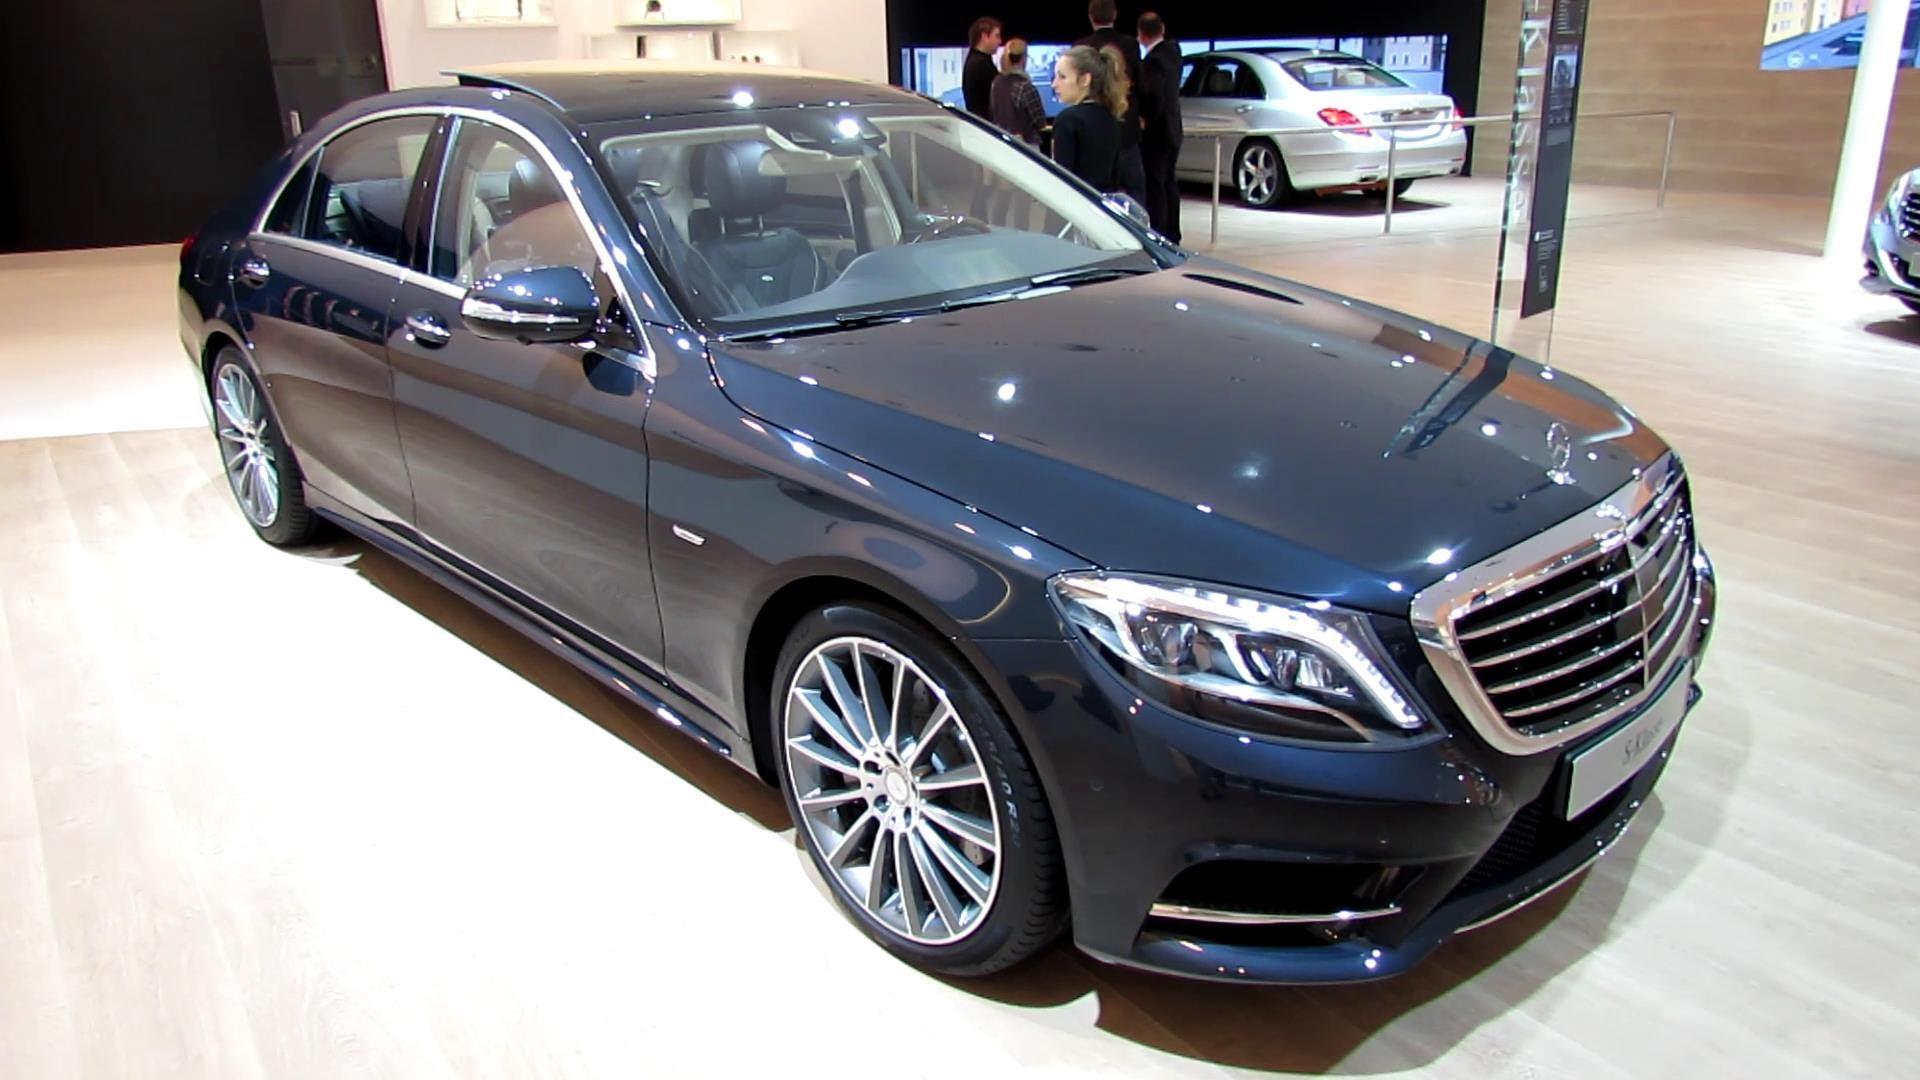 Mercedes-Benz S-klasse VI (W222, C217) 2013 - now Sedan #7